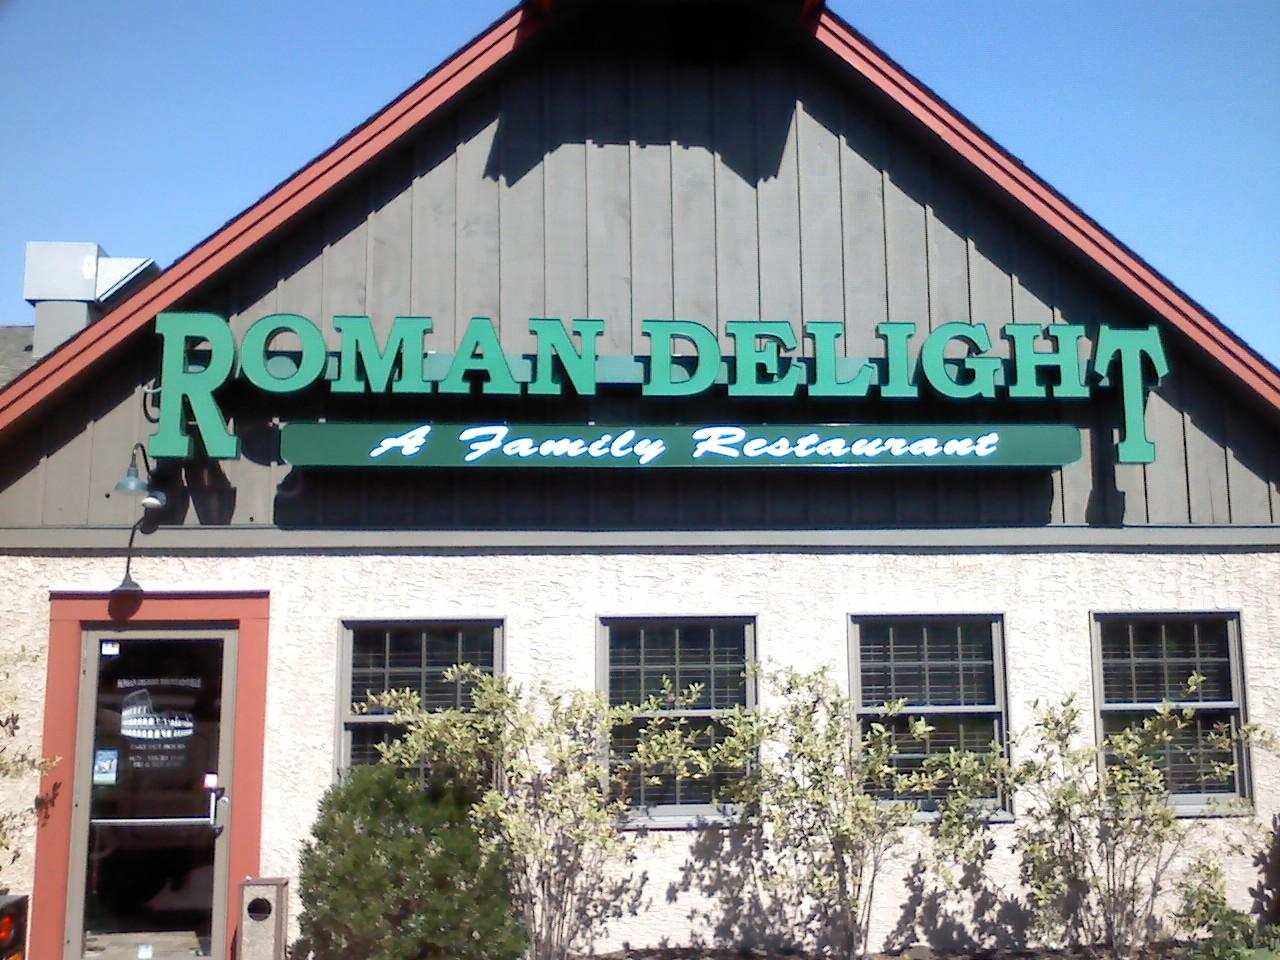 Roman Delight